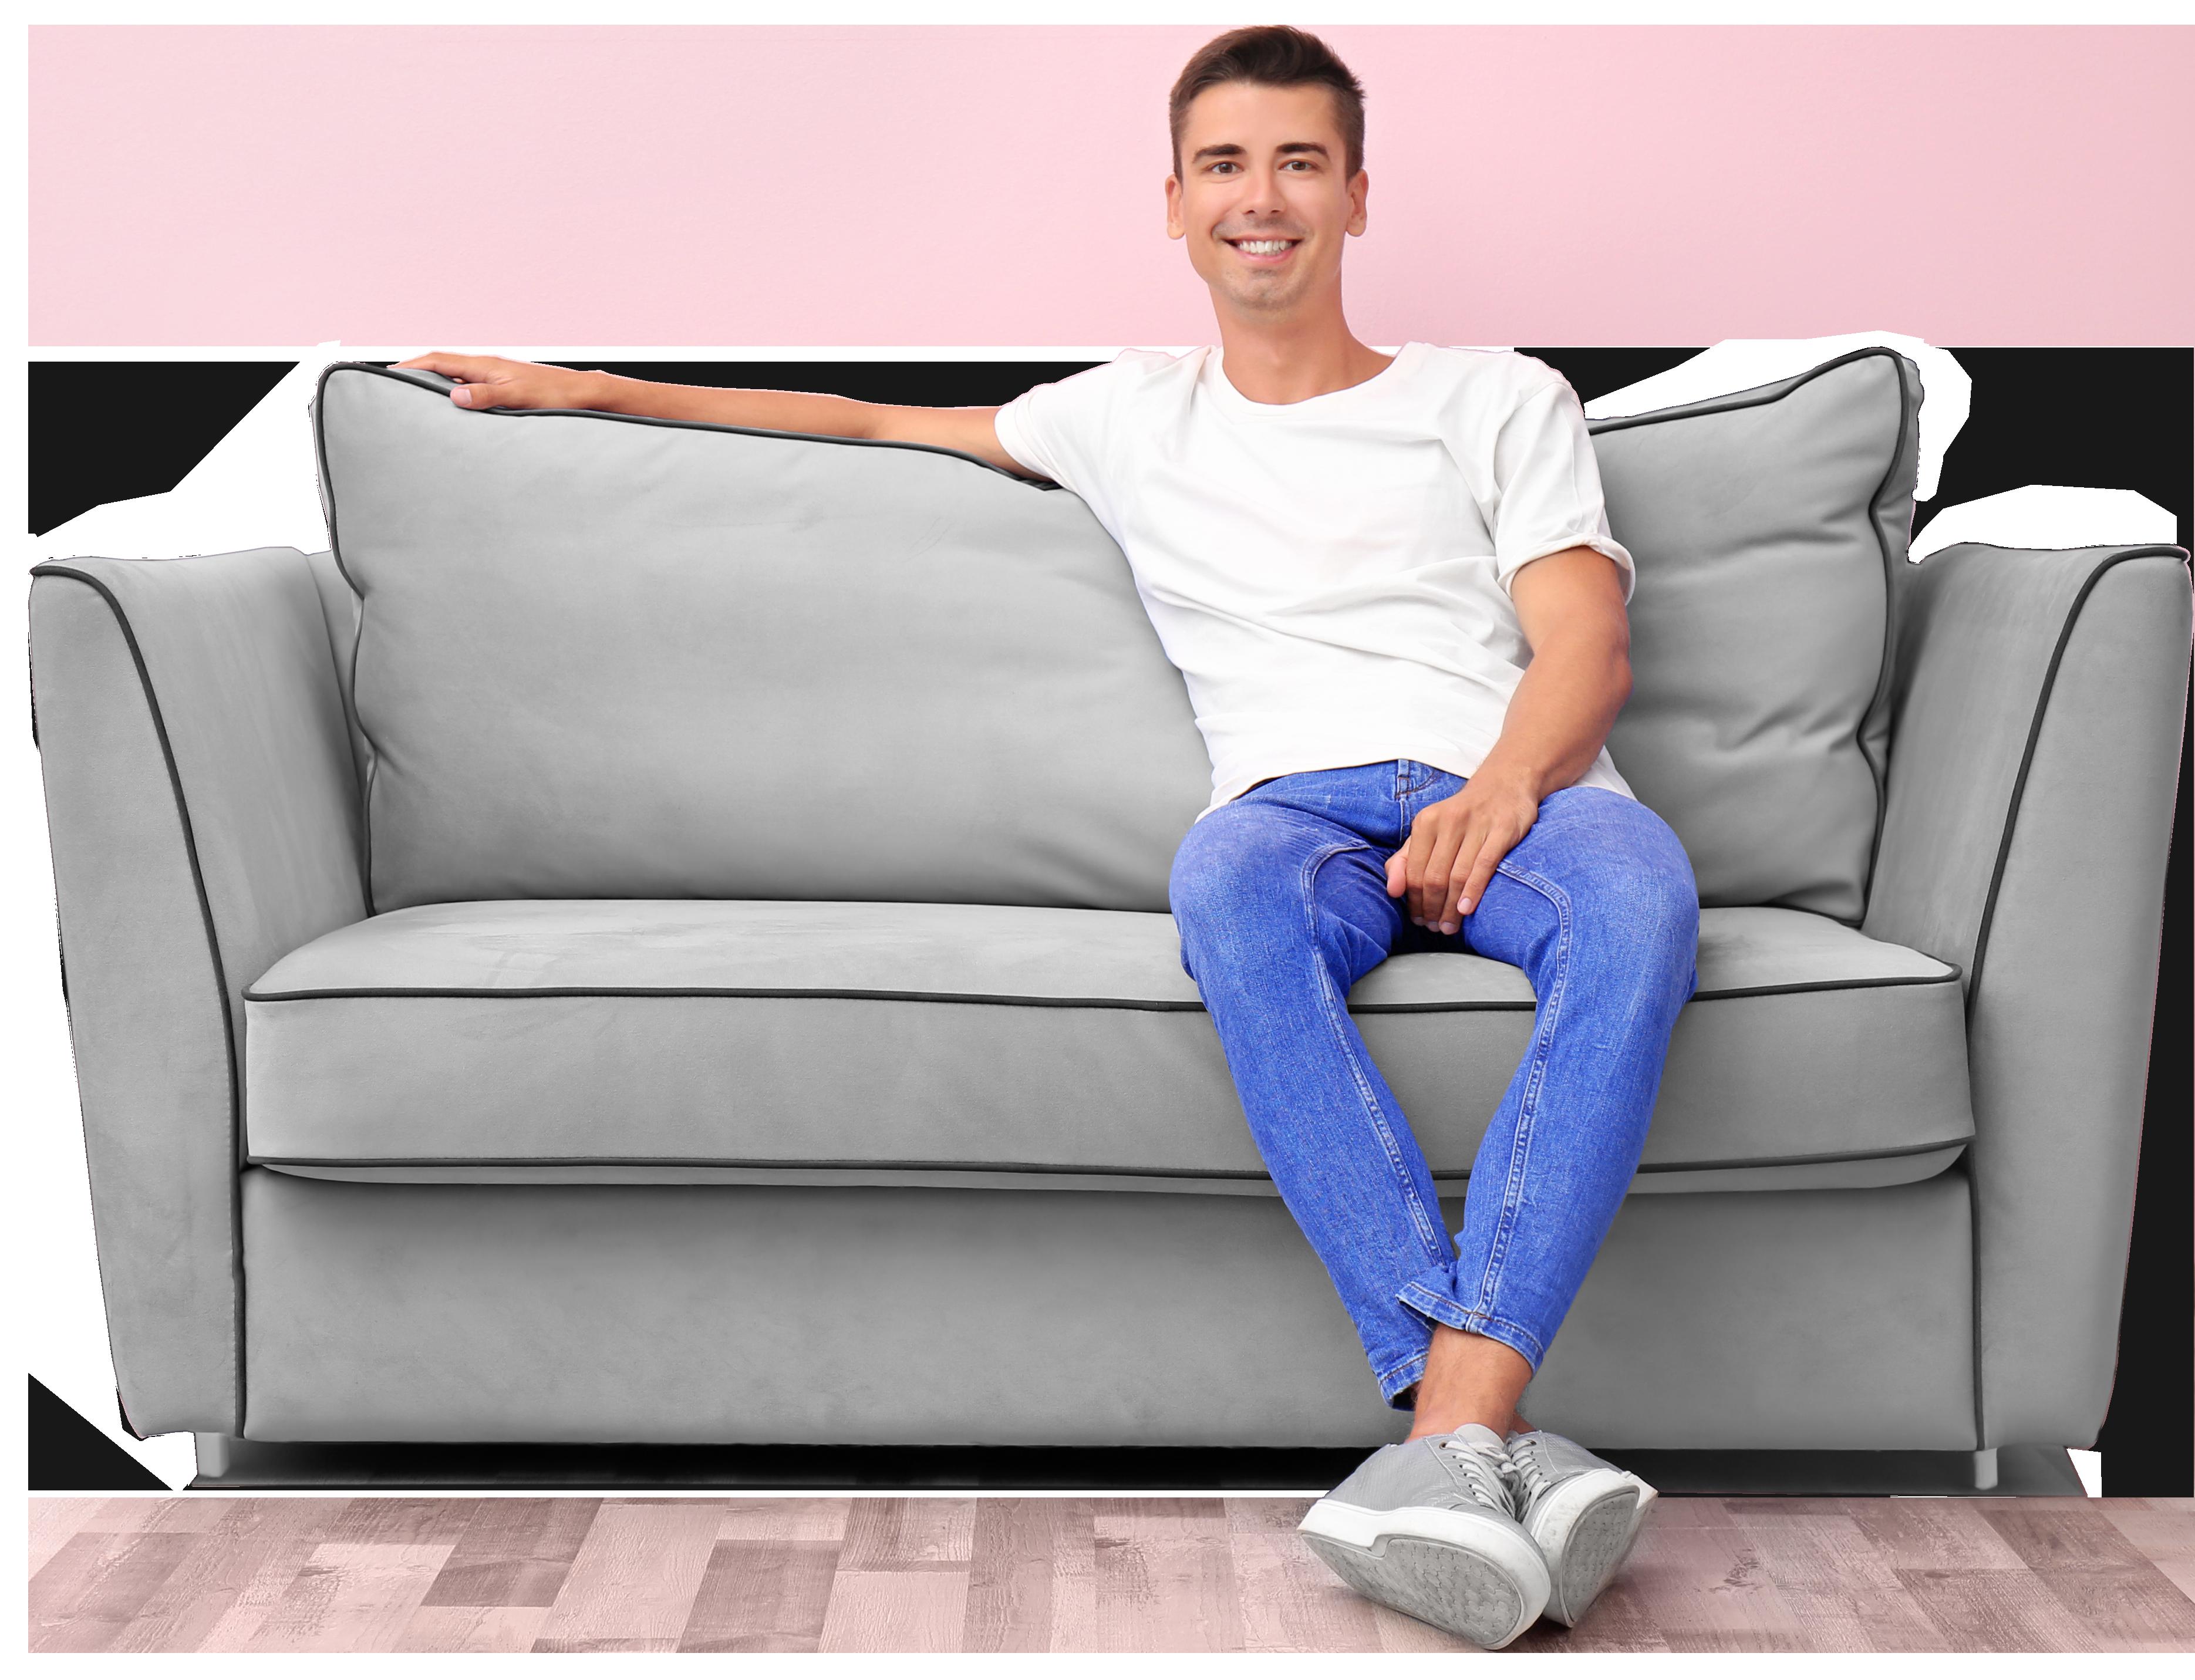 chico sofa